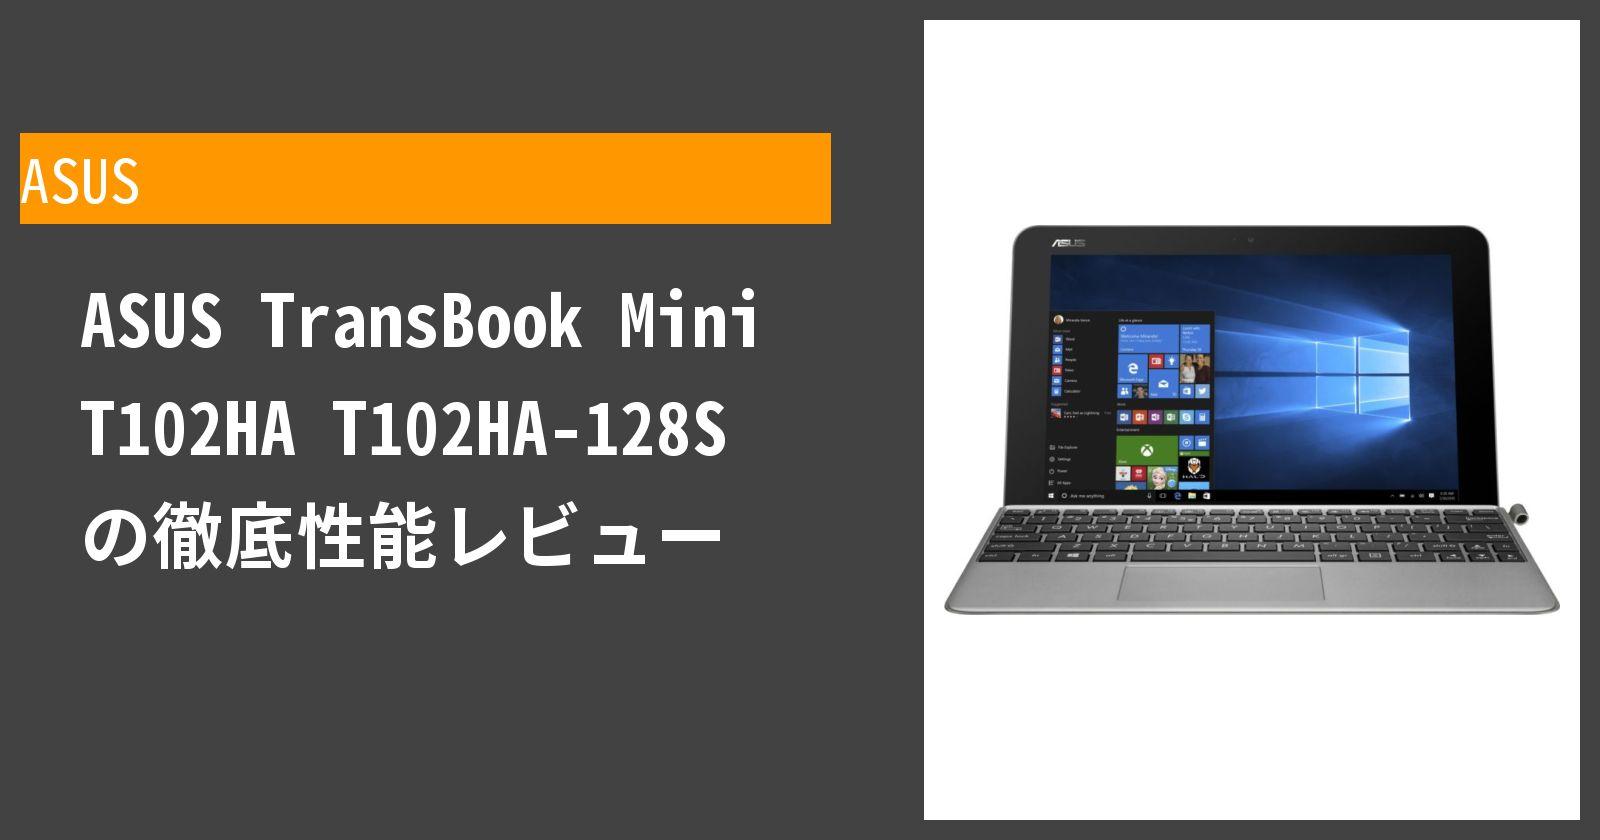 ASUS TransBook Mini T102HA T102HA-128S の徹底性能レビュー